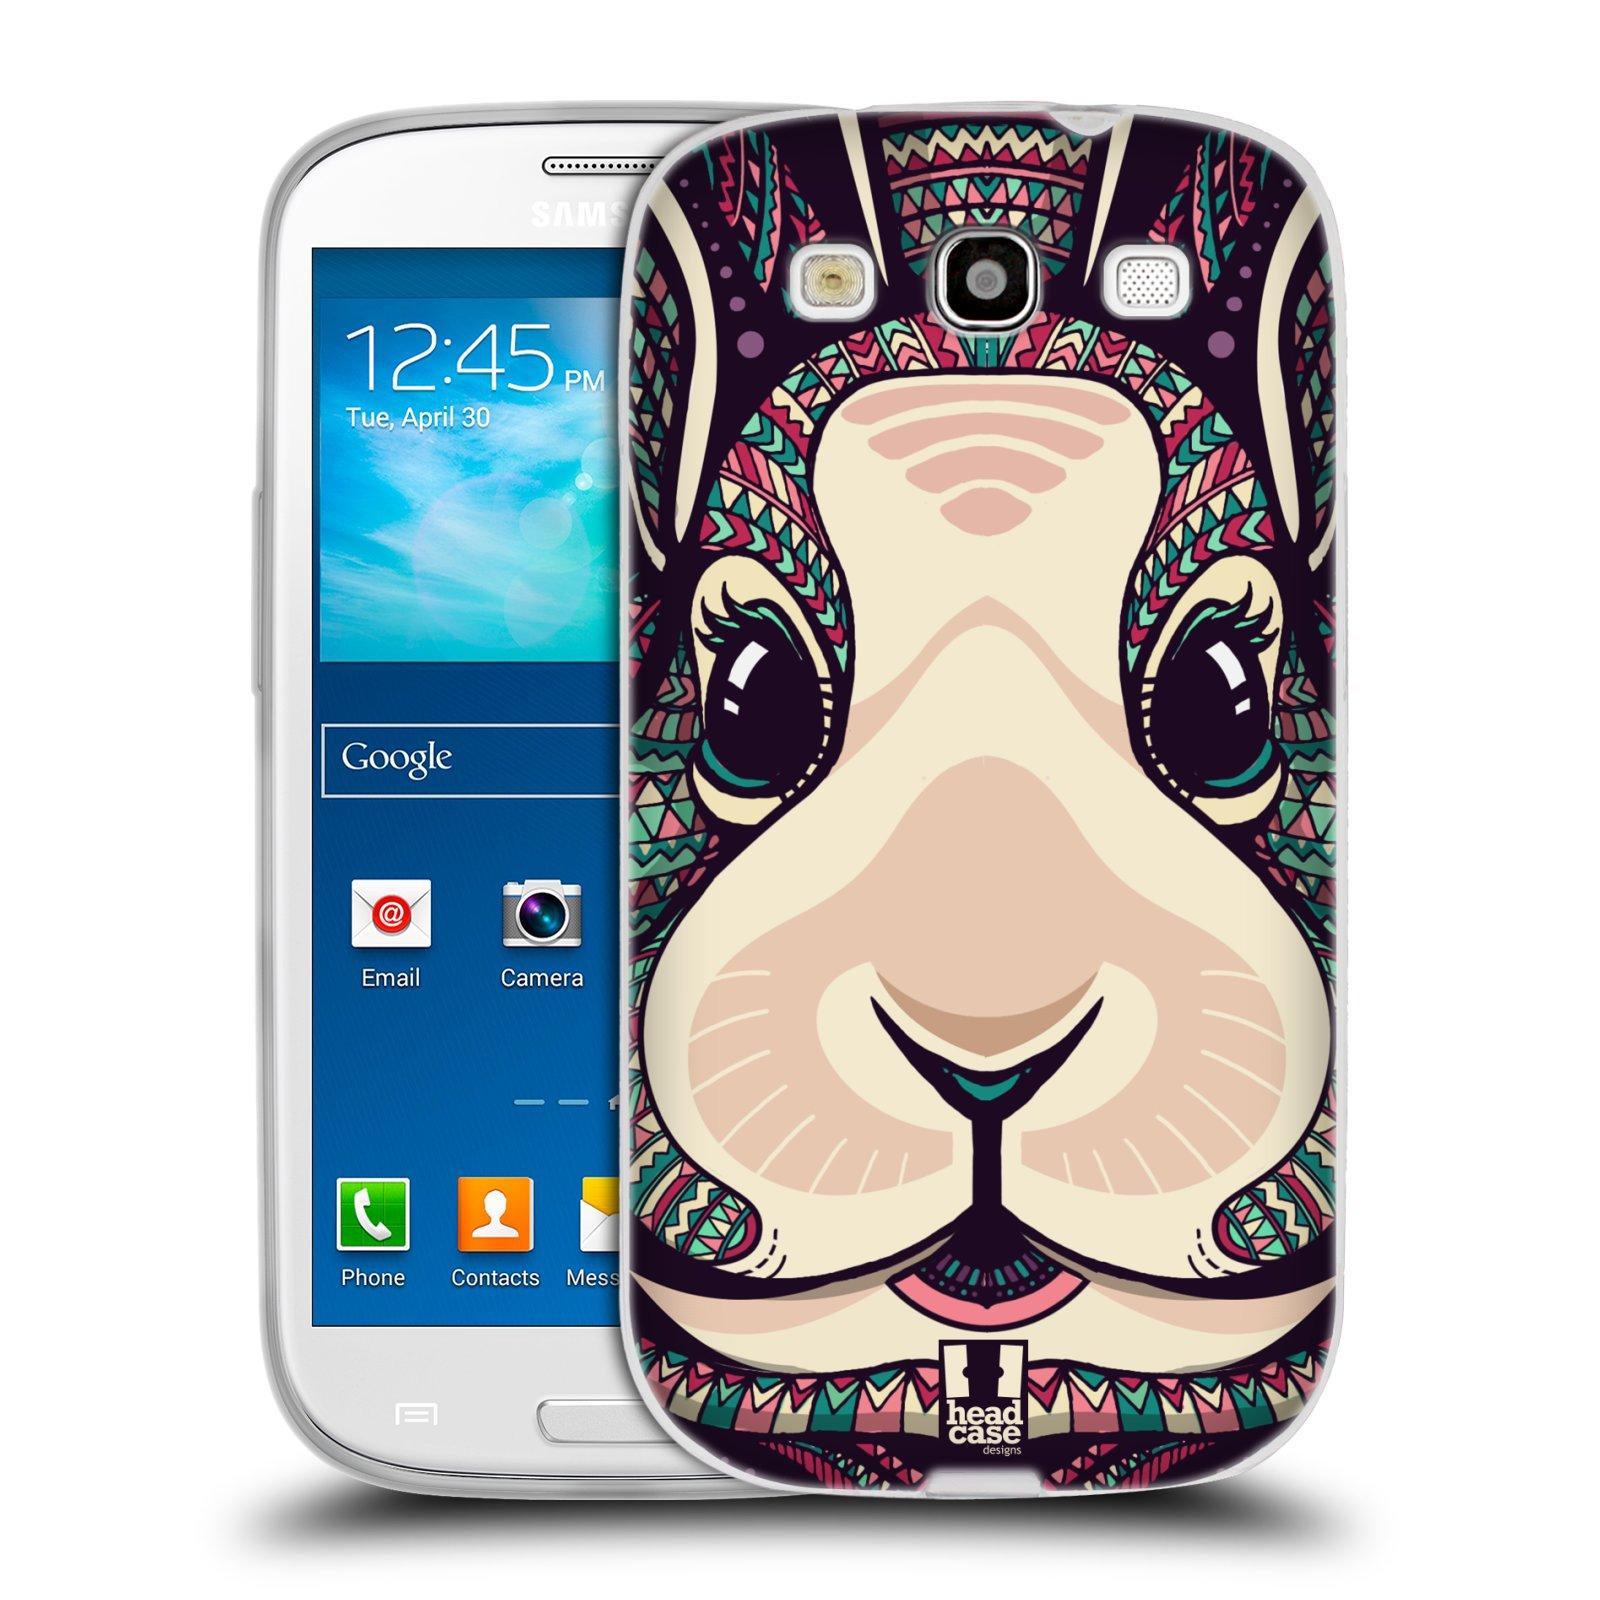 Silikonové pouzdro na mobil Samsung Galaxy S3 Neo HEAD CASE AZTEC ZAJÍČEK (Silikonový kryt či obal na mobilní telefon Samsung Galaxy S3 Neo GT-i9301i)